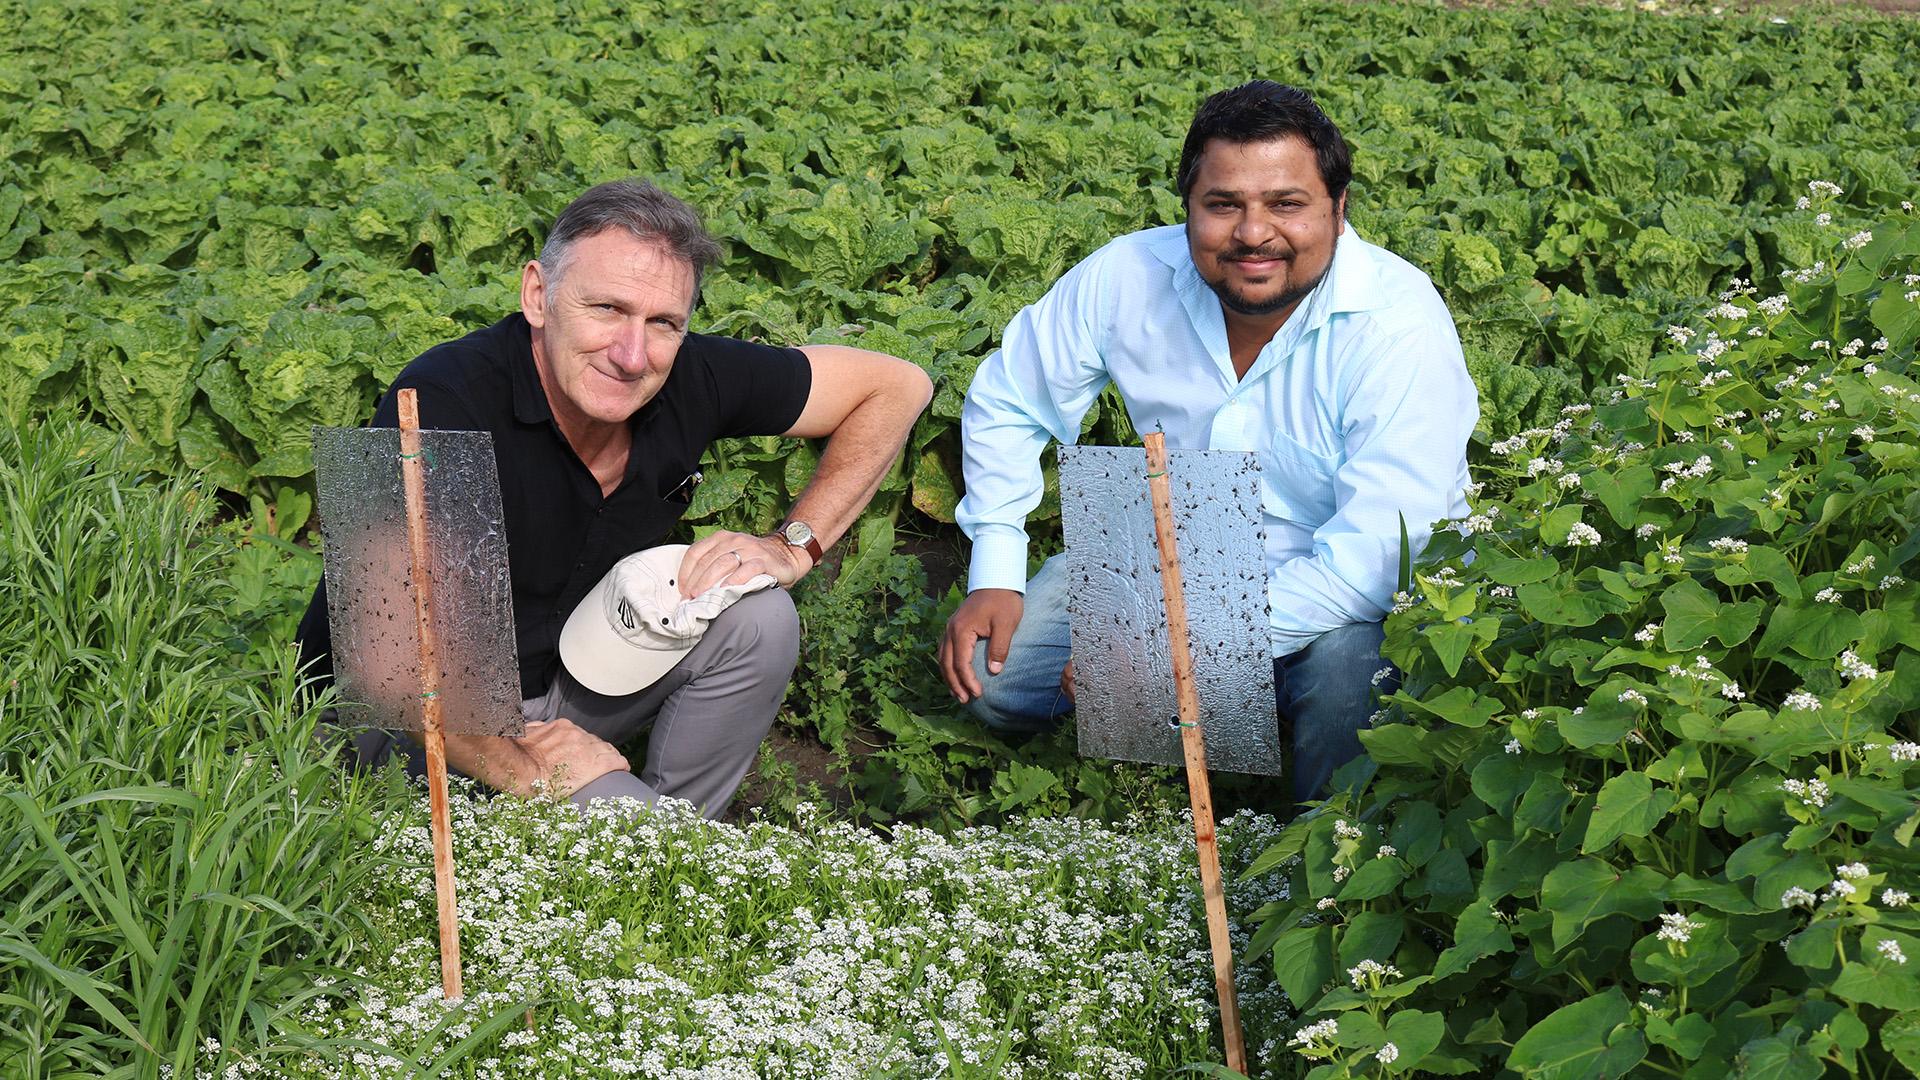 Professor Geoff Gurr and Dr Syed Rizvi